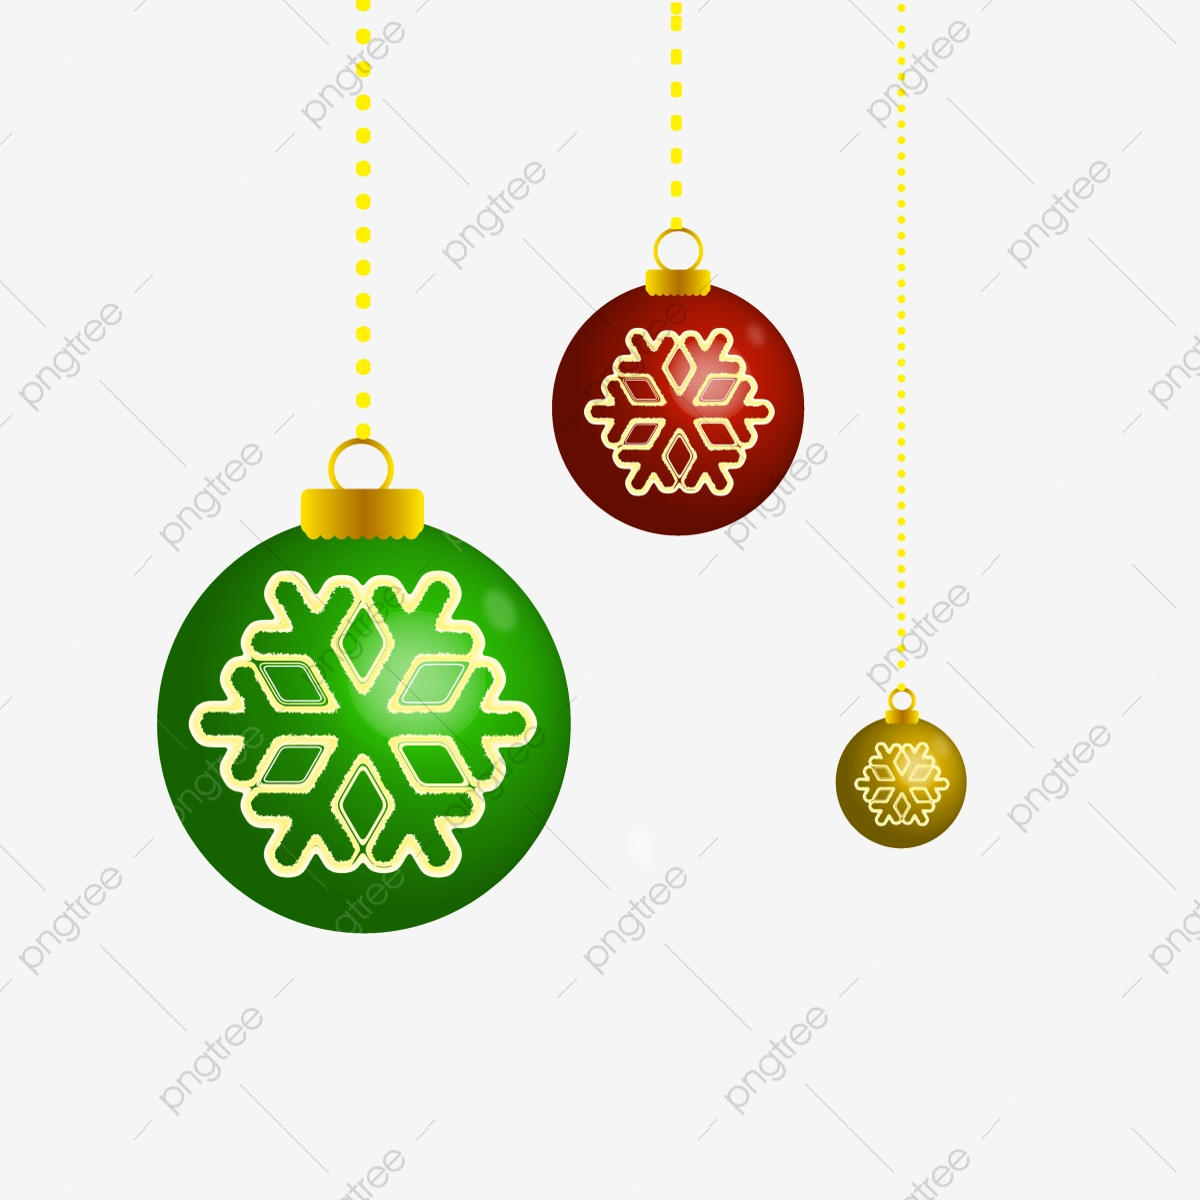 Gold Christmas Ornaments Png.Christmas Golden Ball Cartoon Snowflake Gift Box Golden